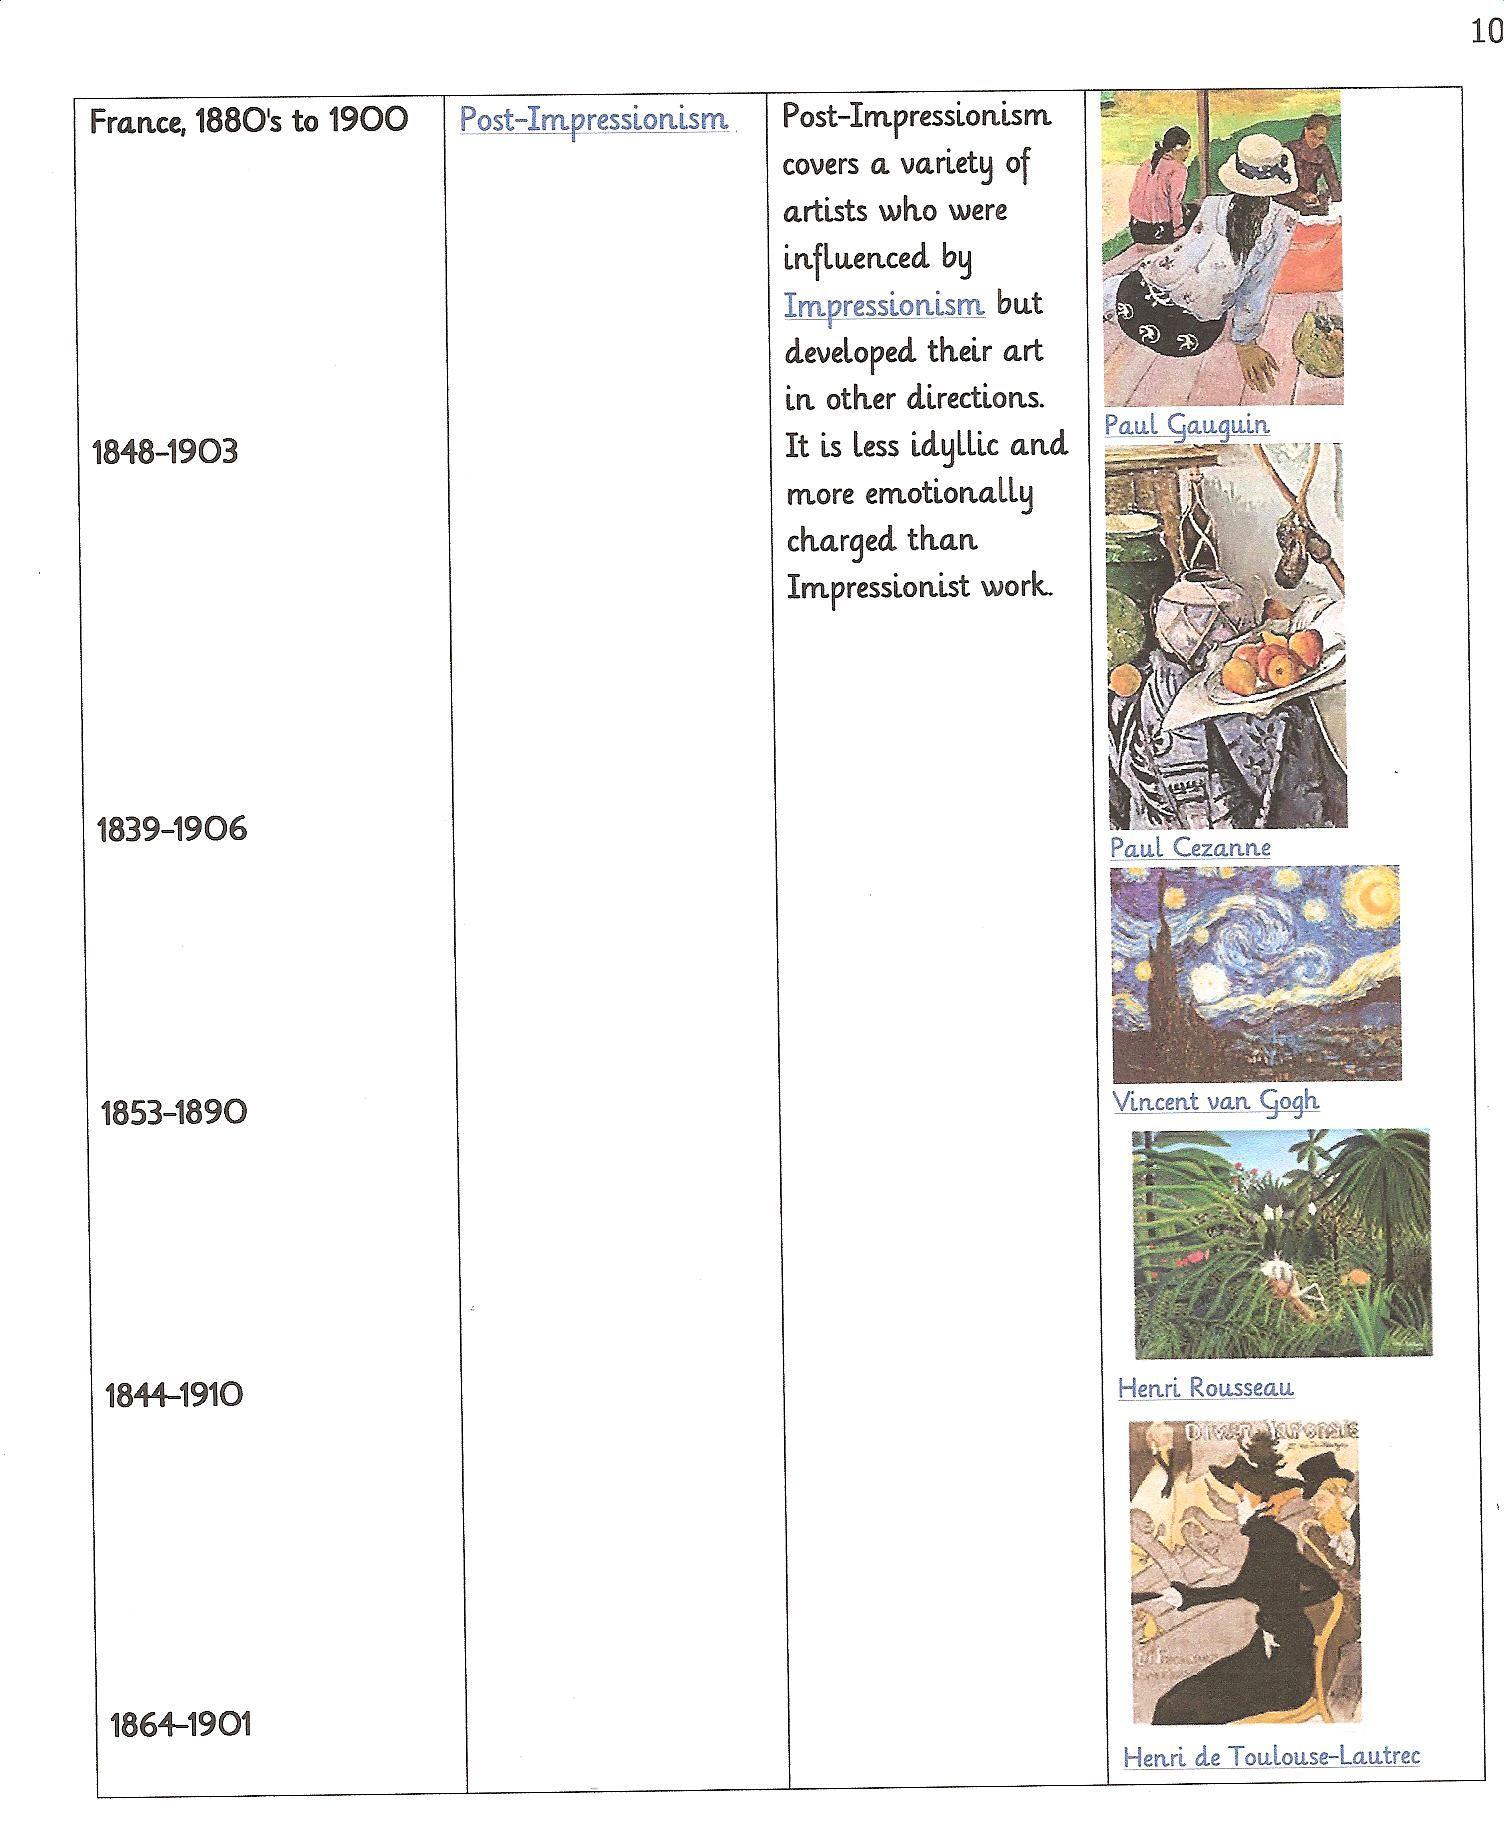 Art Era Timeline #2 ~ 19th Century Art | Art eras, Art history and ...